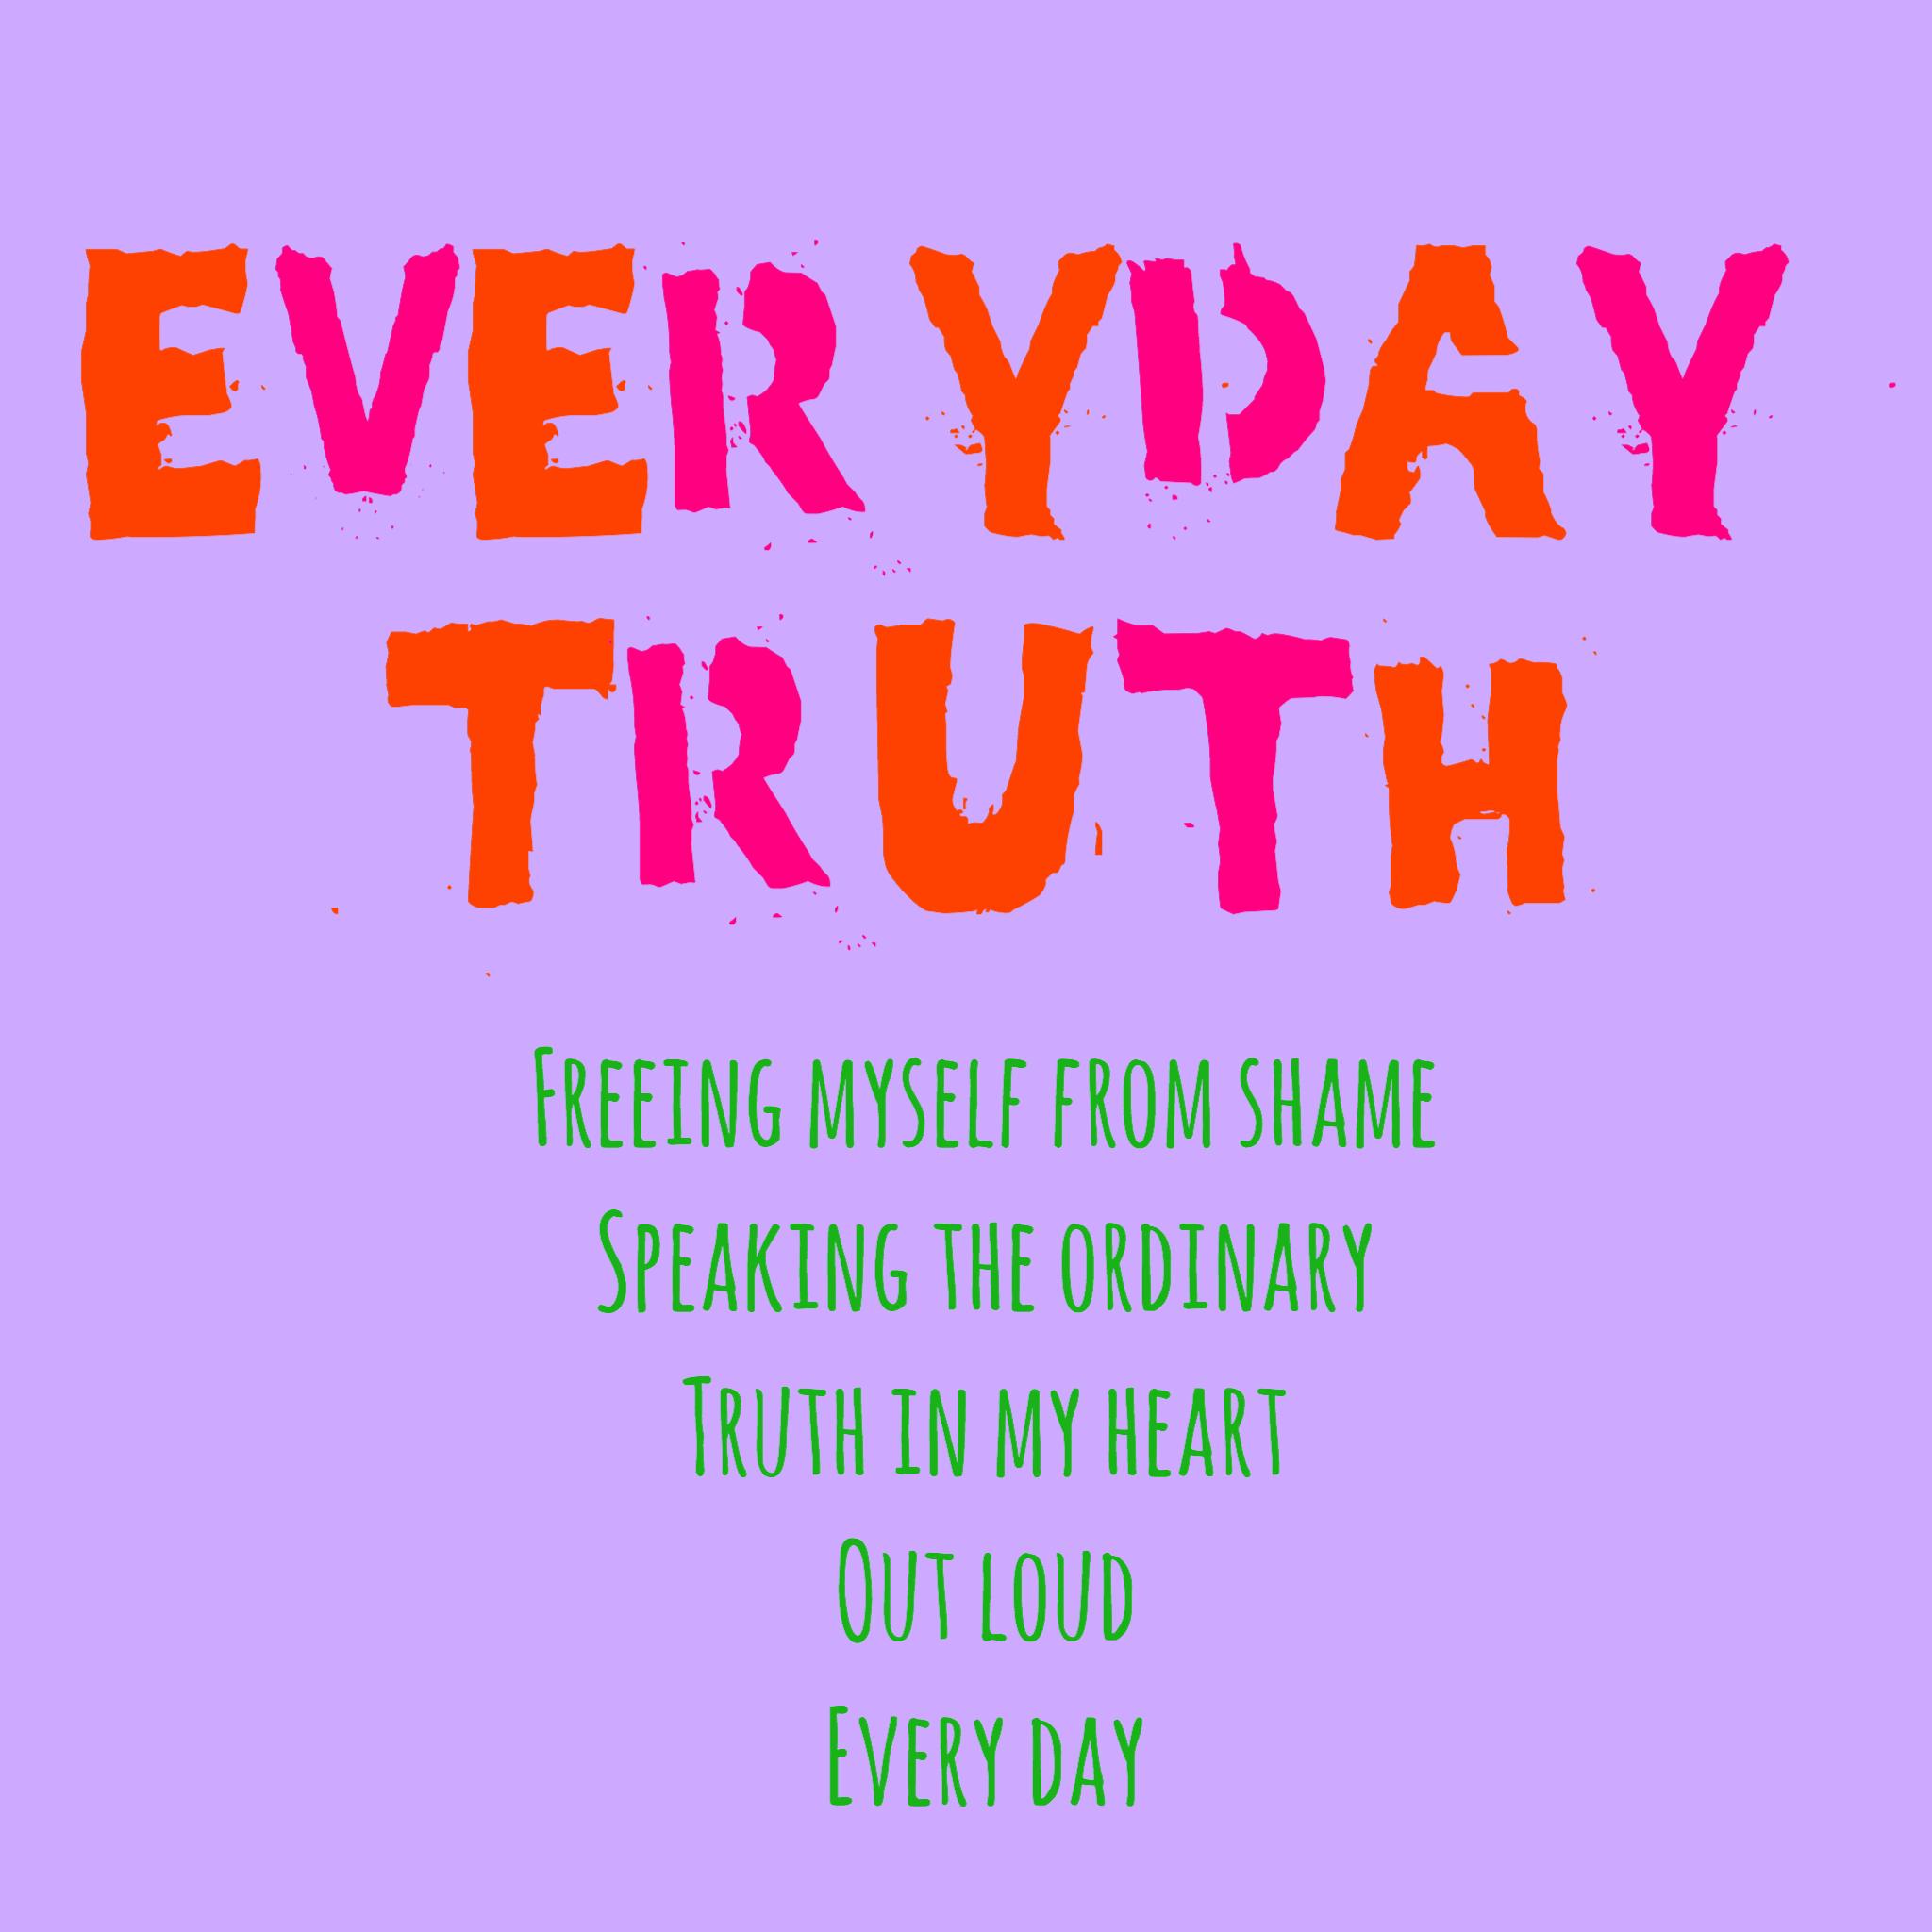 Everyday Truth square.JPG